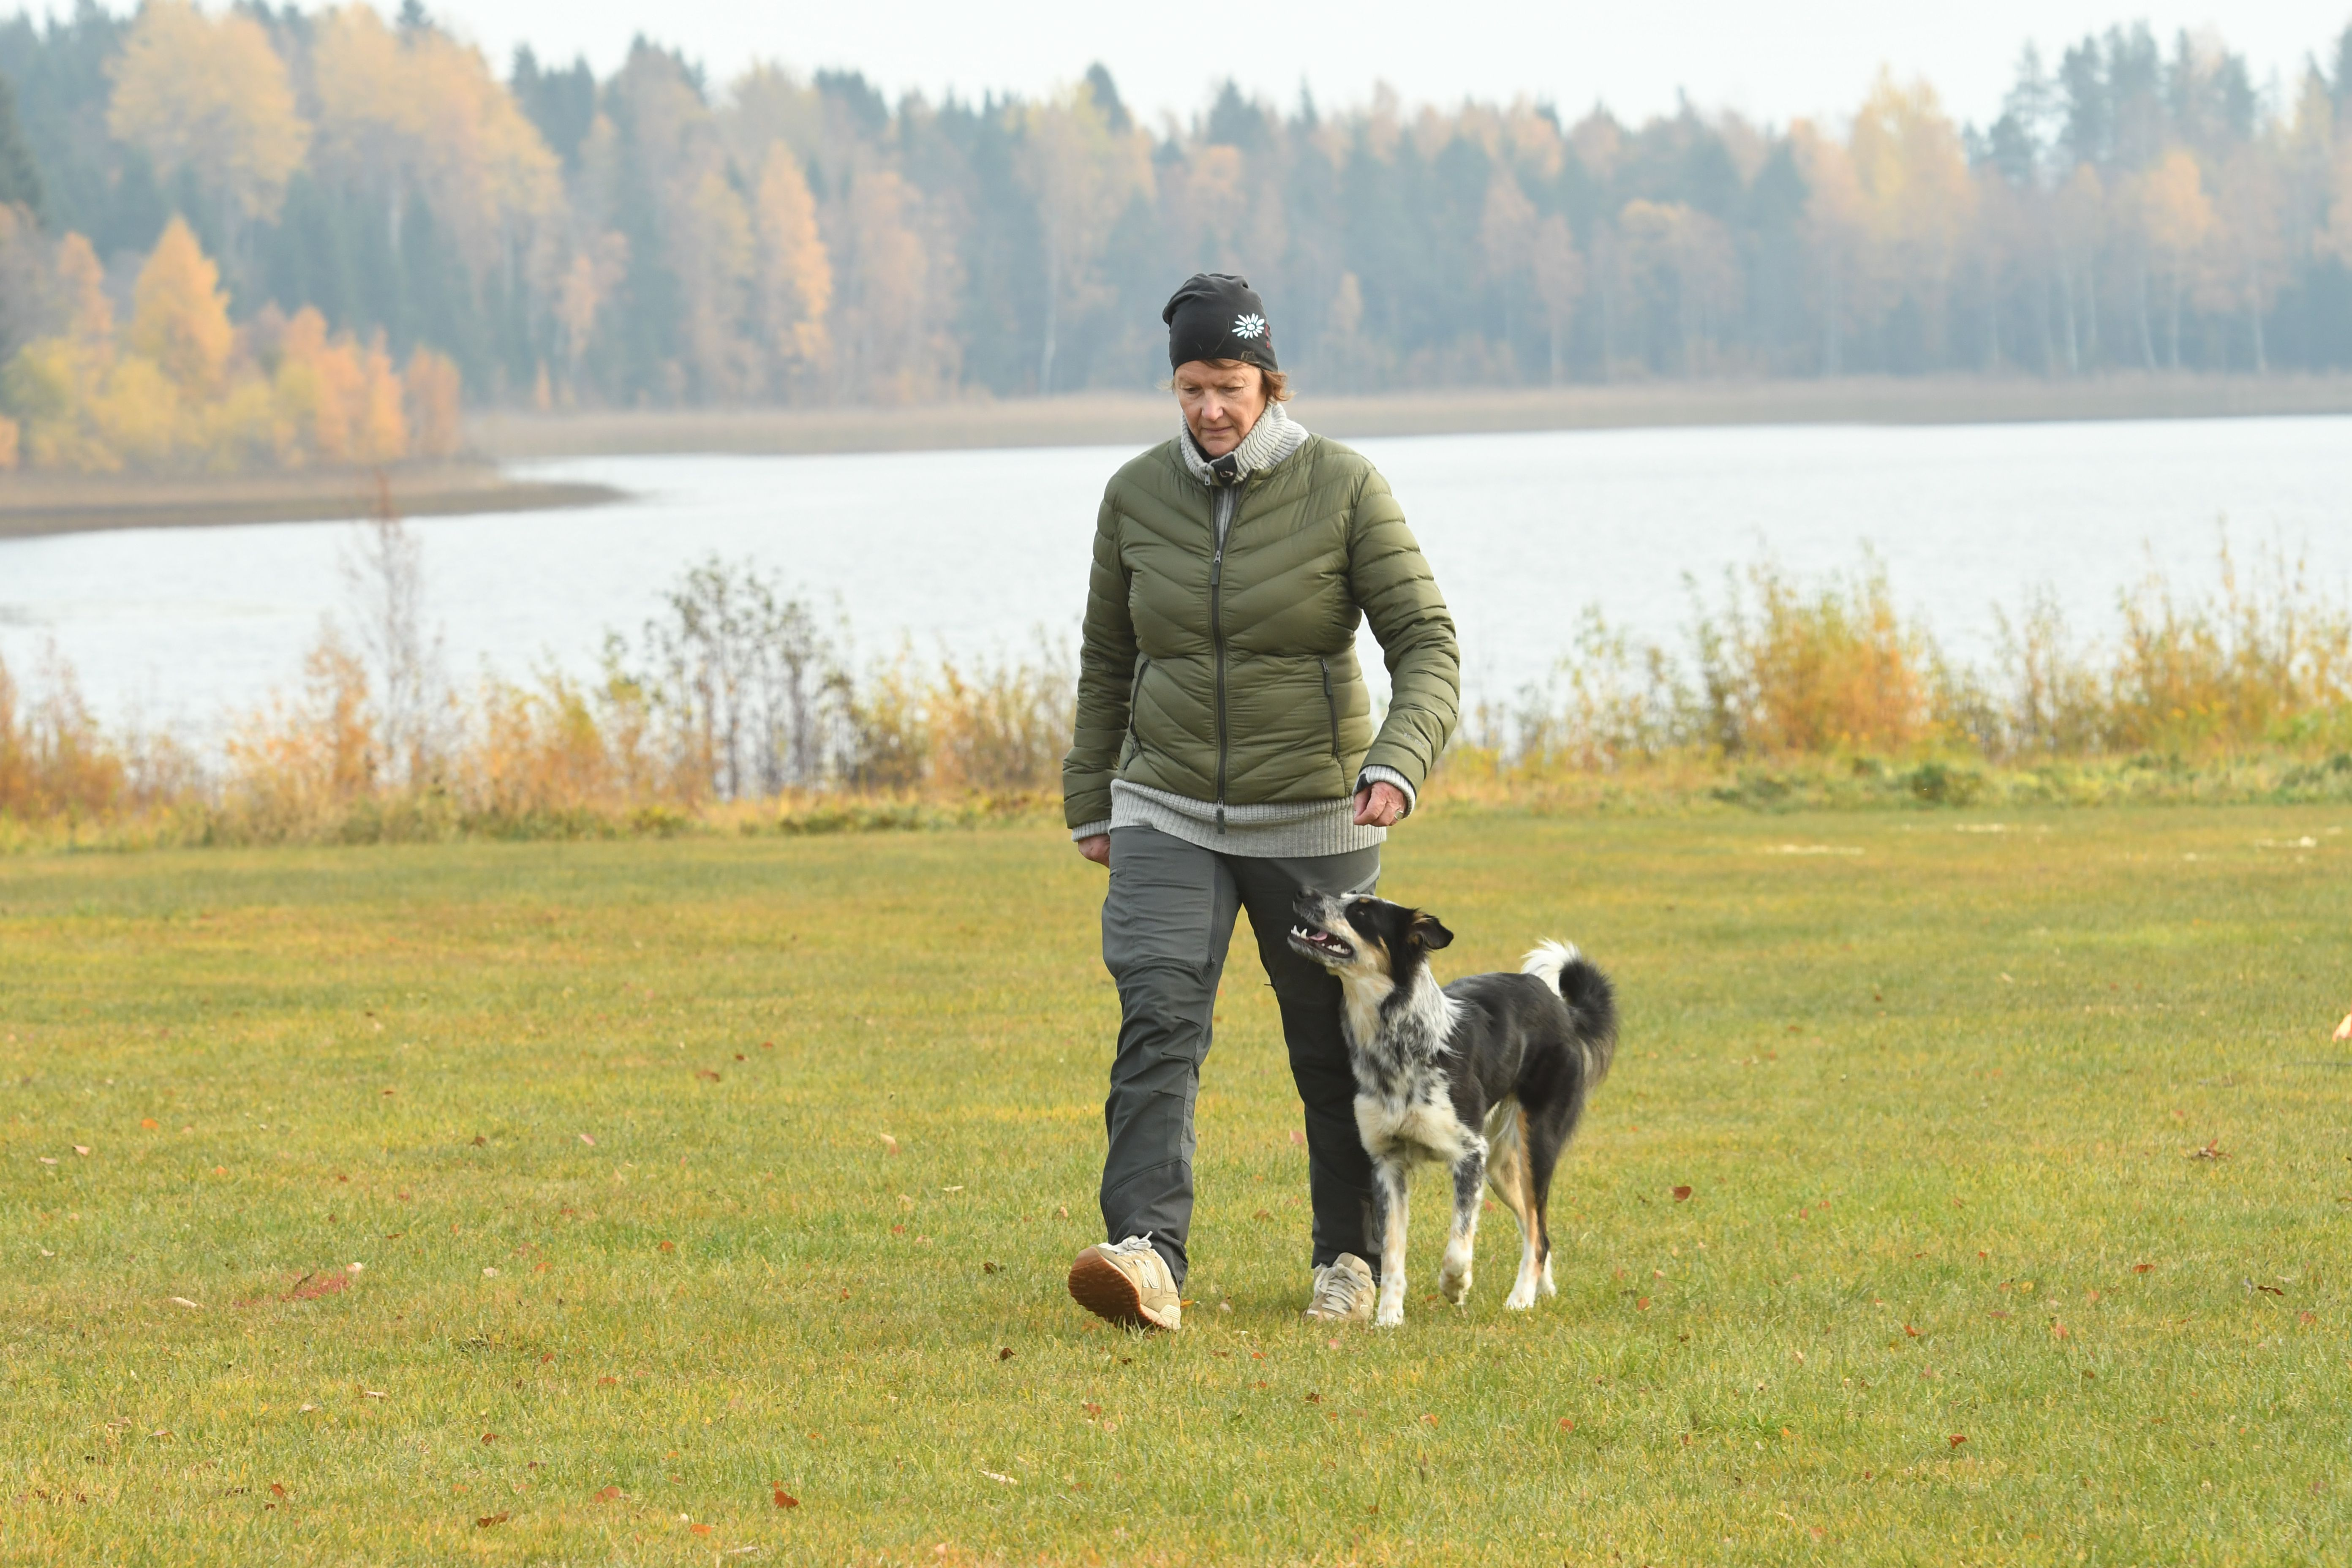 Sport Dog Academy, Fotograf Lena Eriksson, Formtoppa hunden